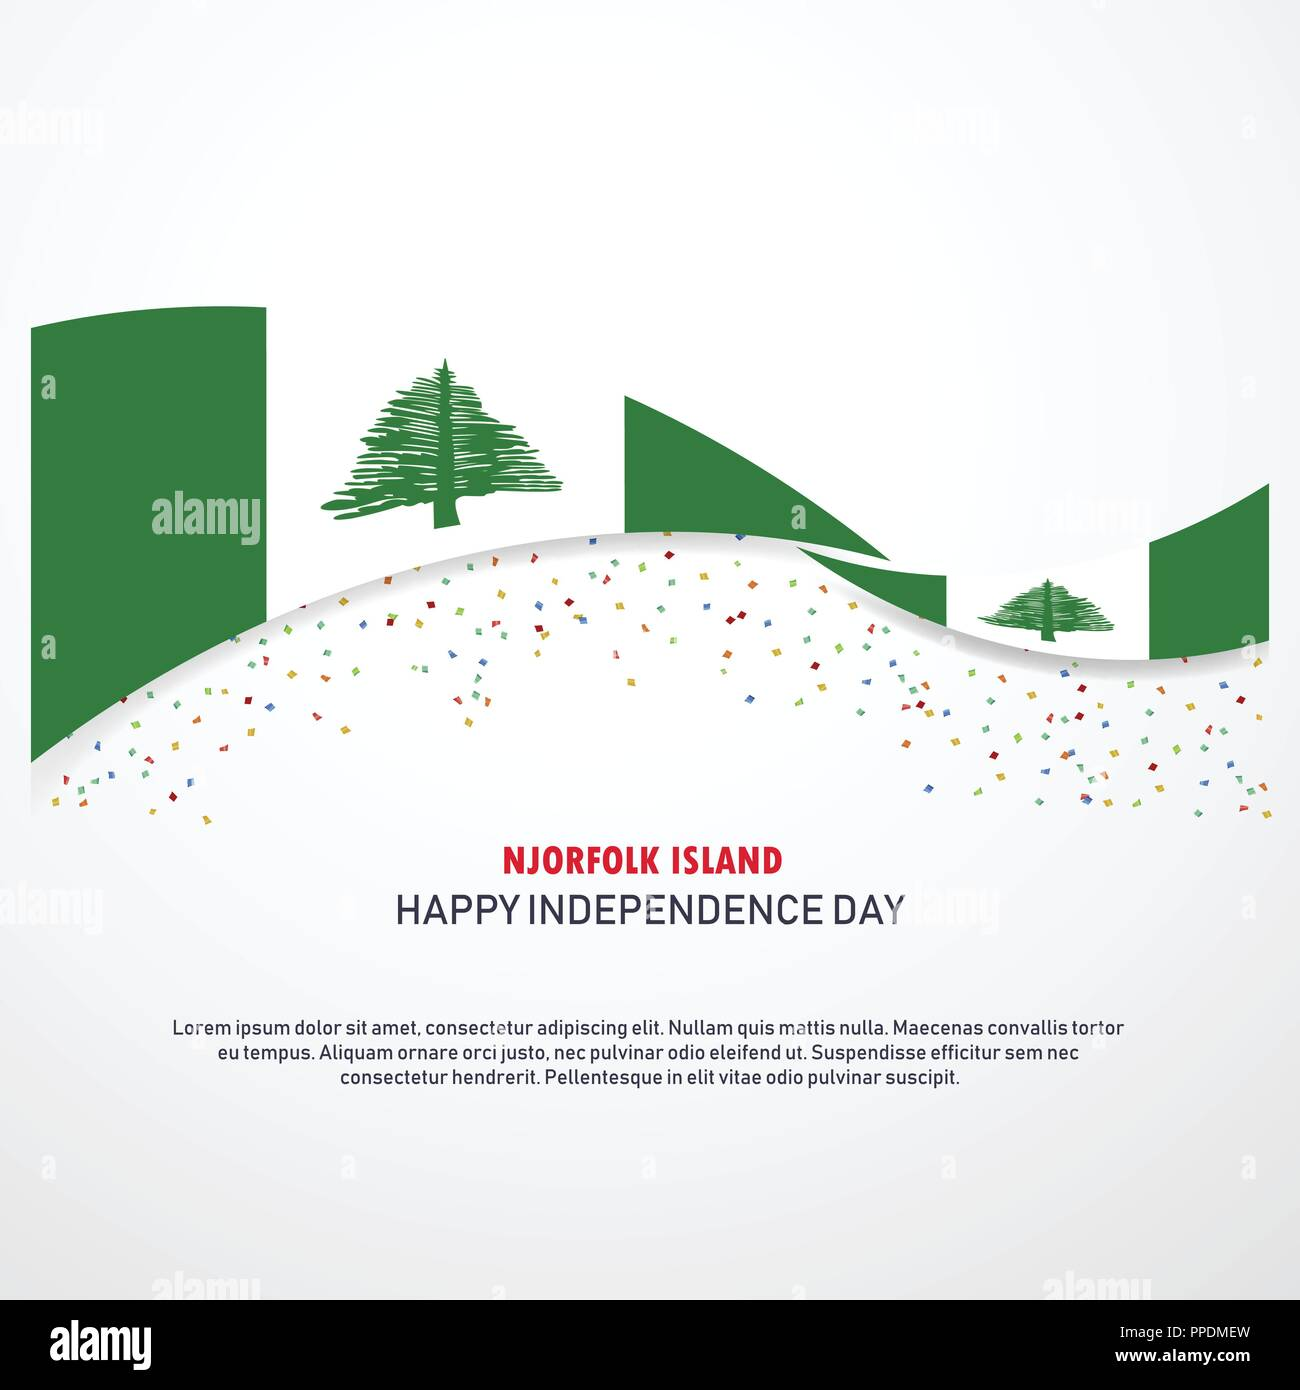 NJorfolk Island Happy independence day Background Stock Vector